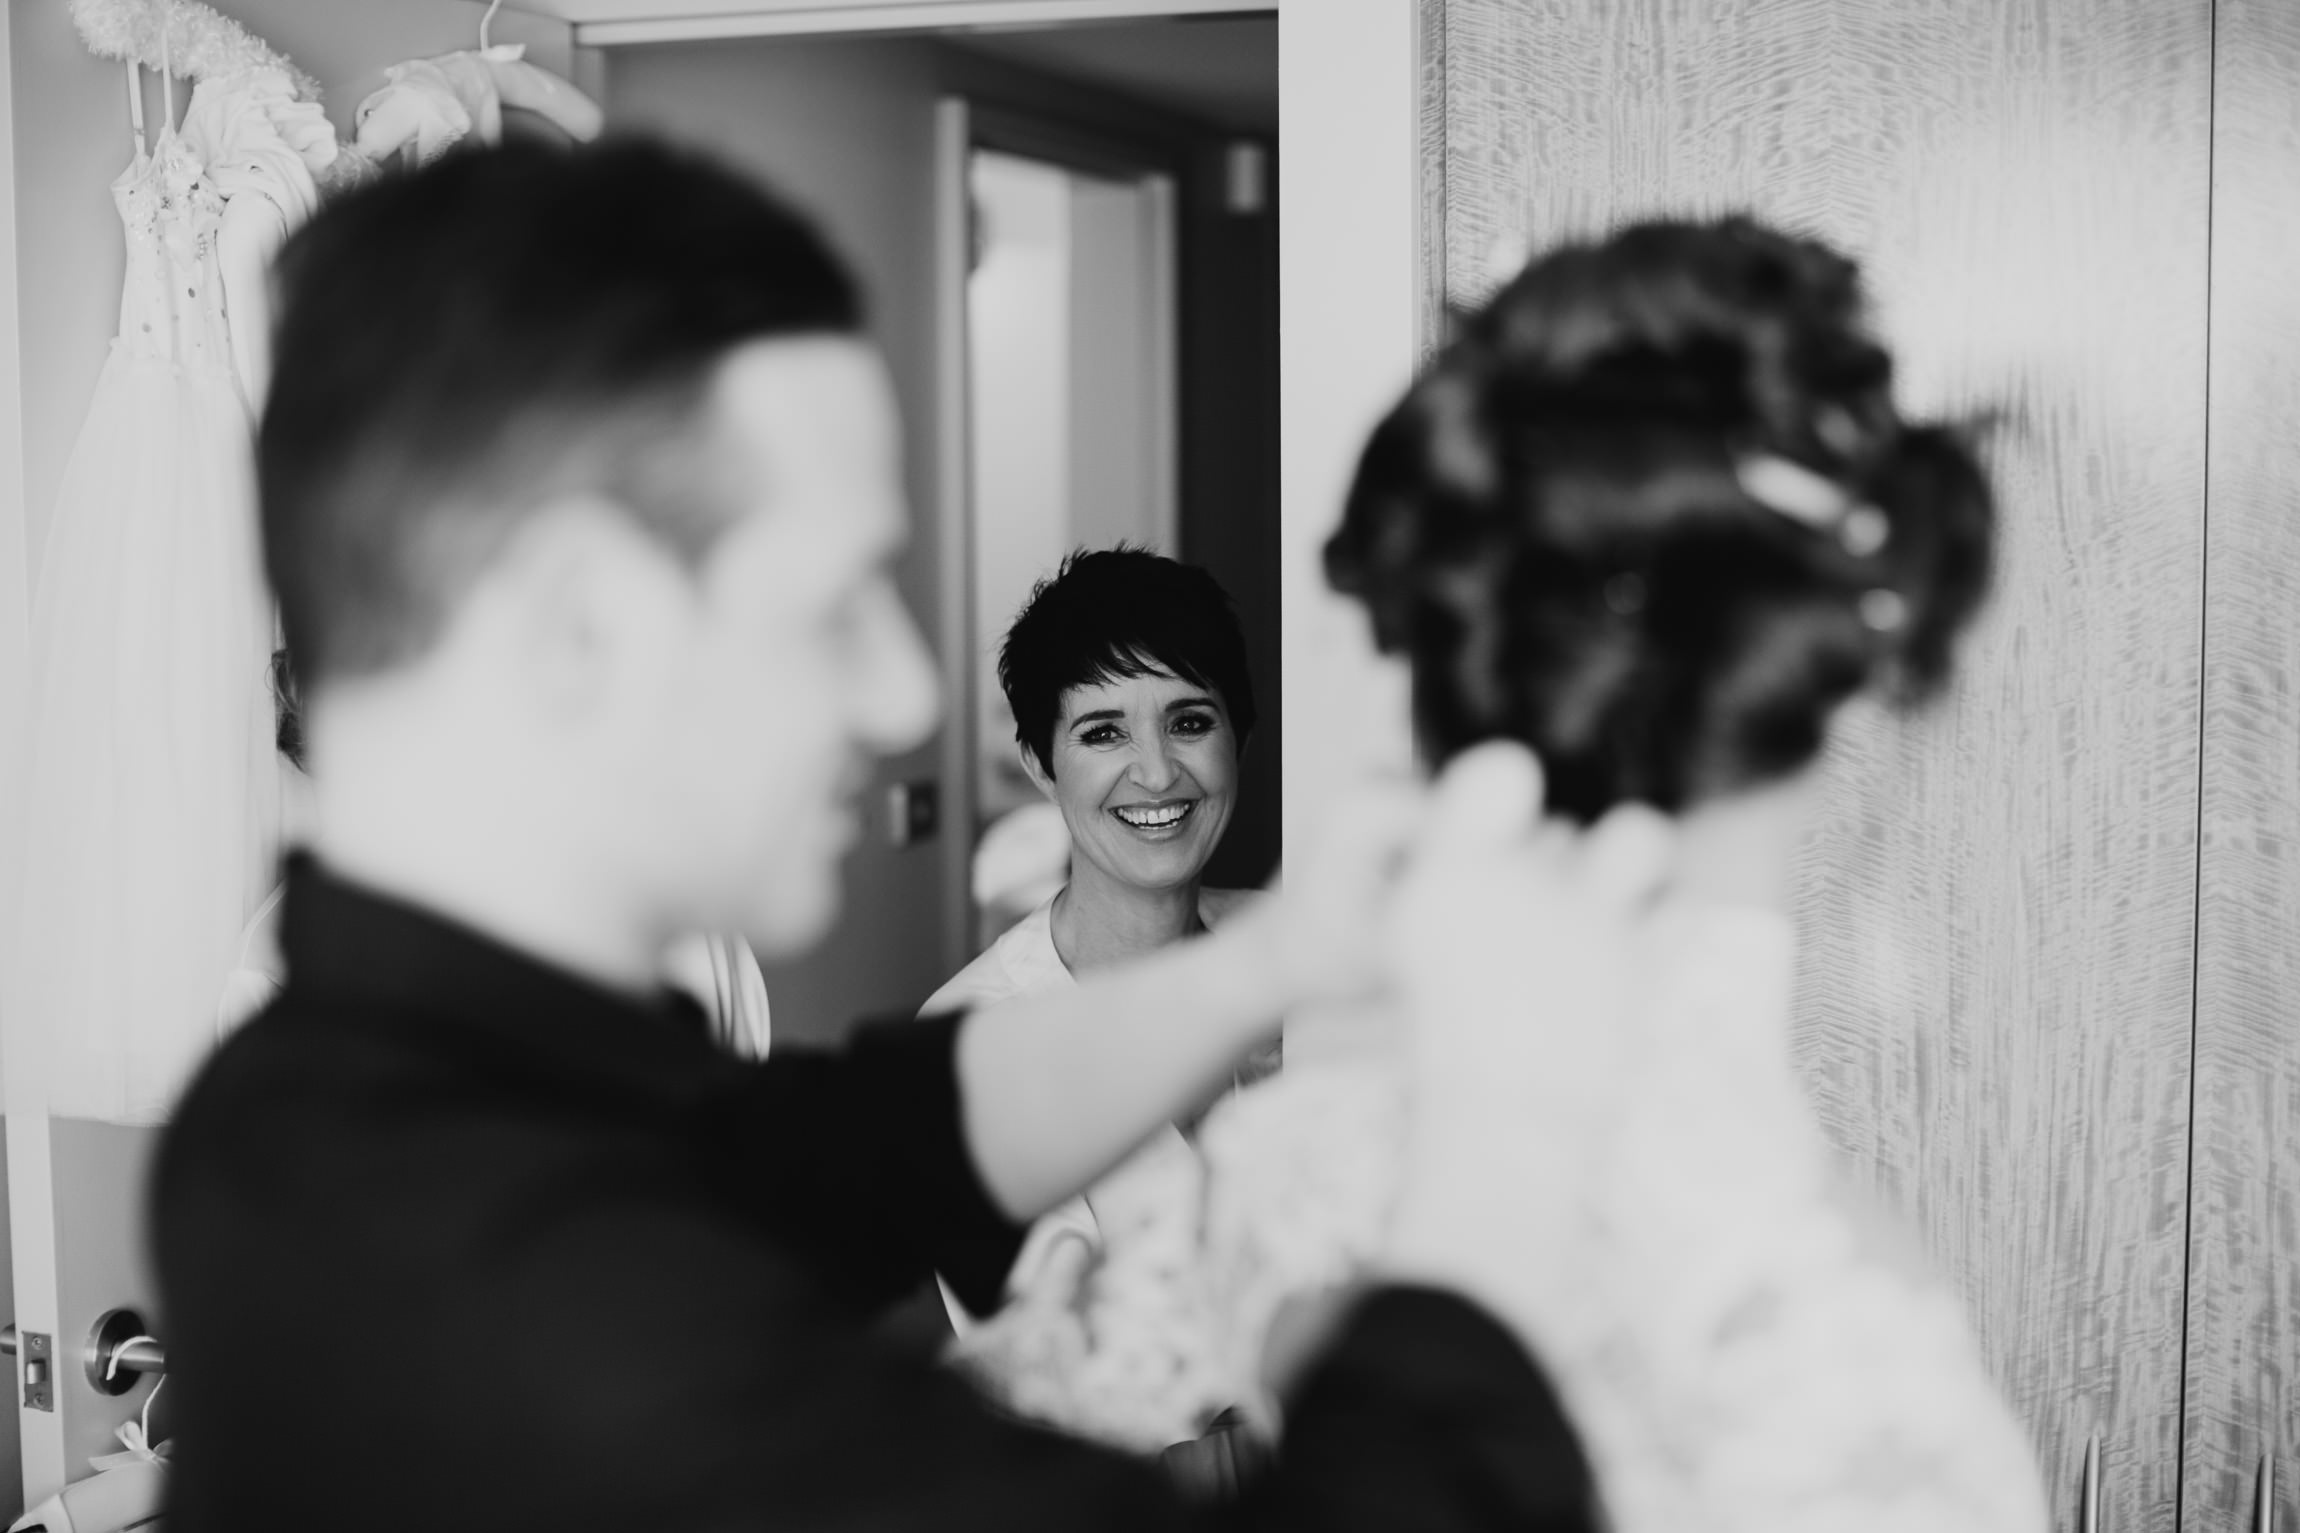 150623_justinaaron_wedding_bianca_ruben_pr-007.jpg